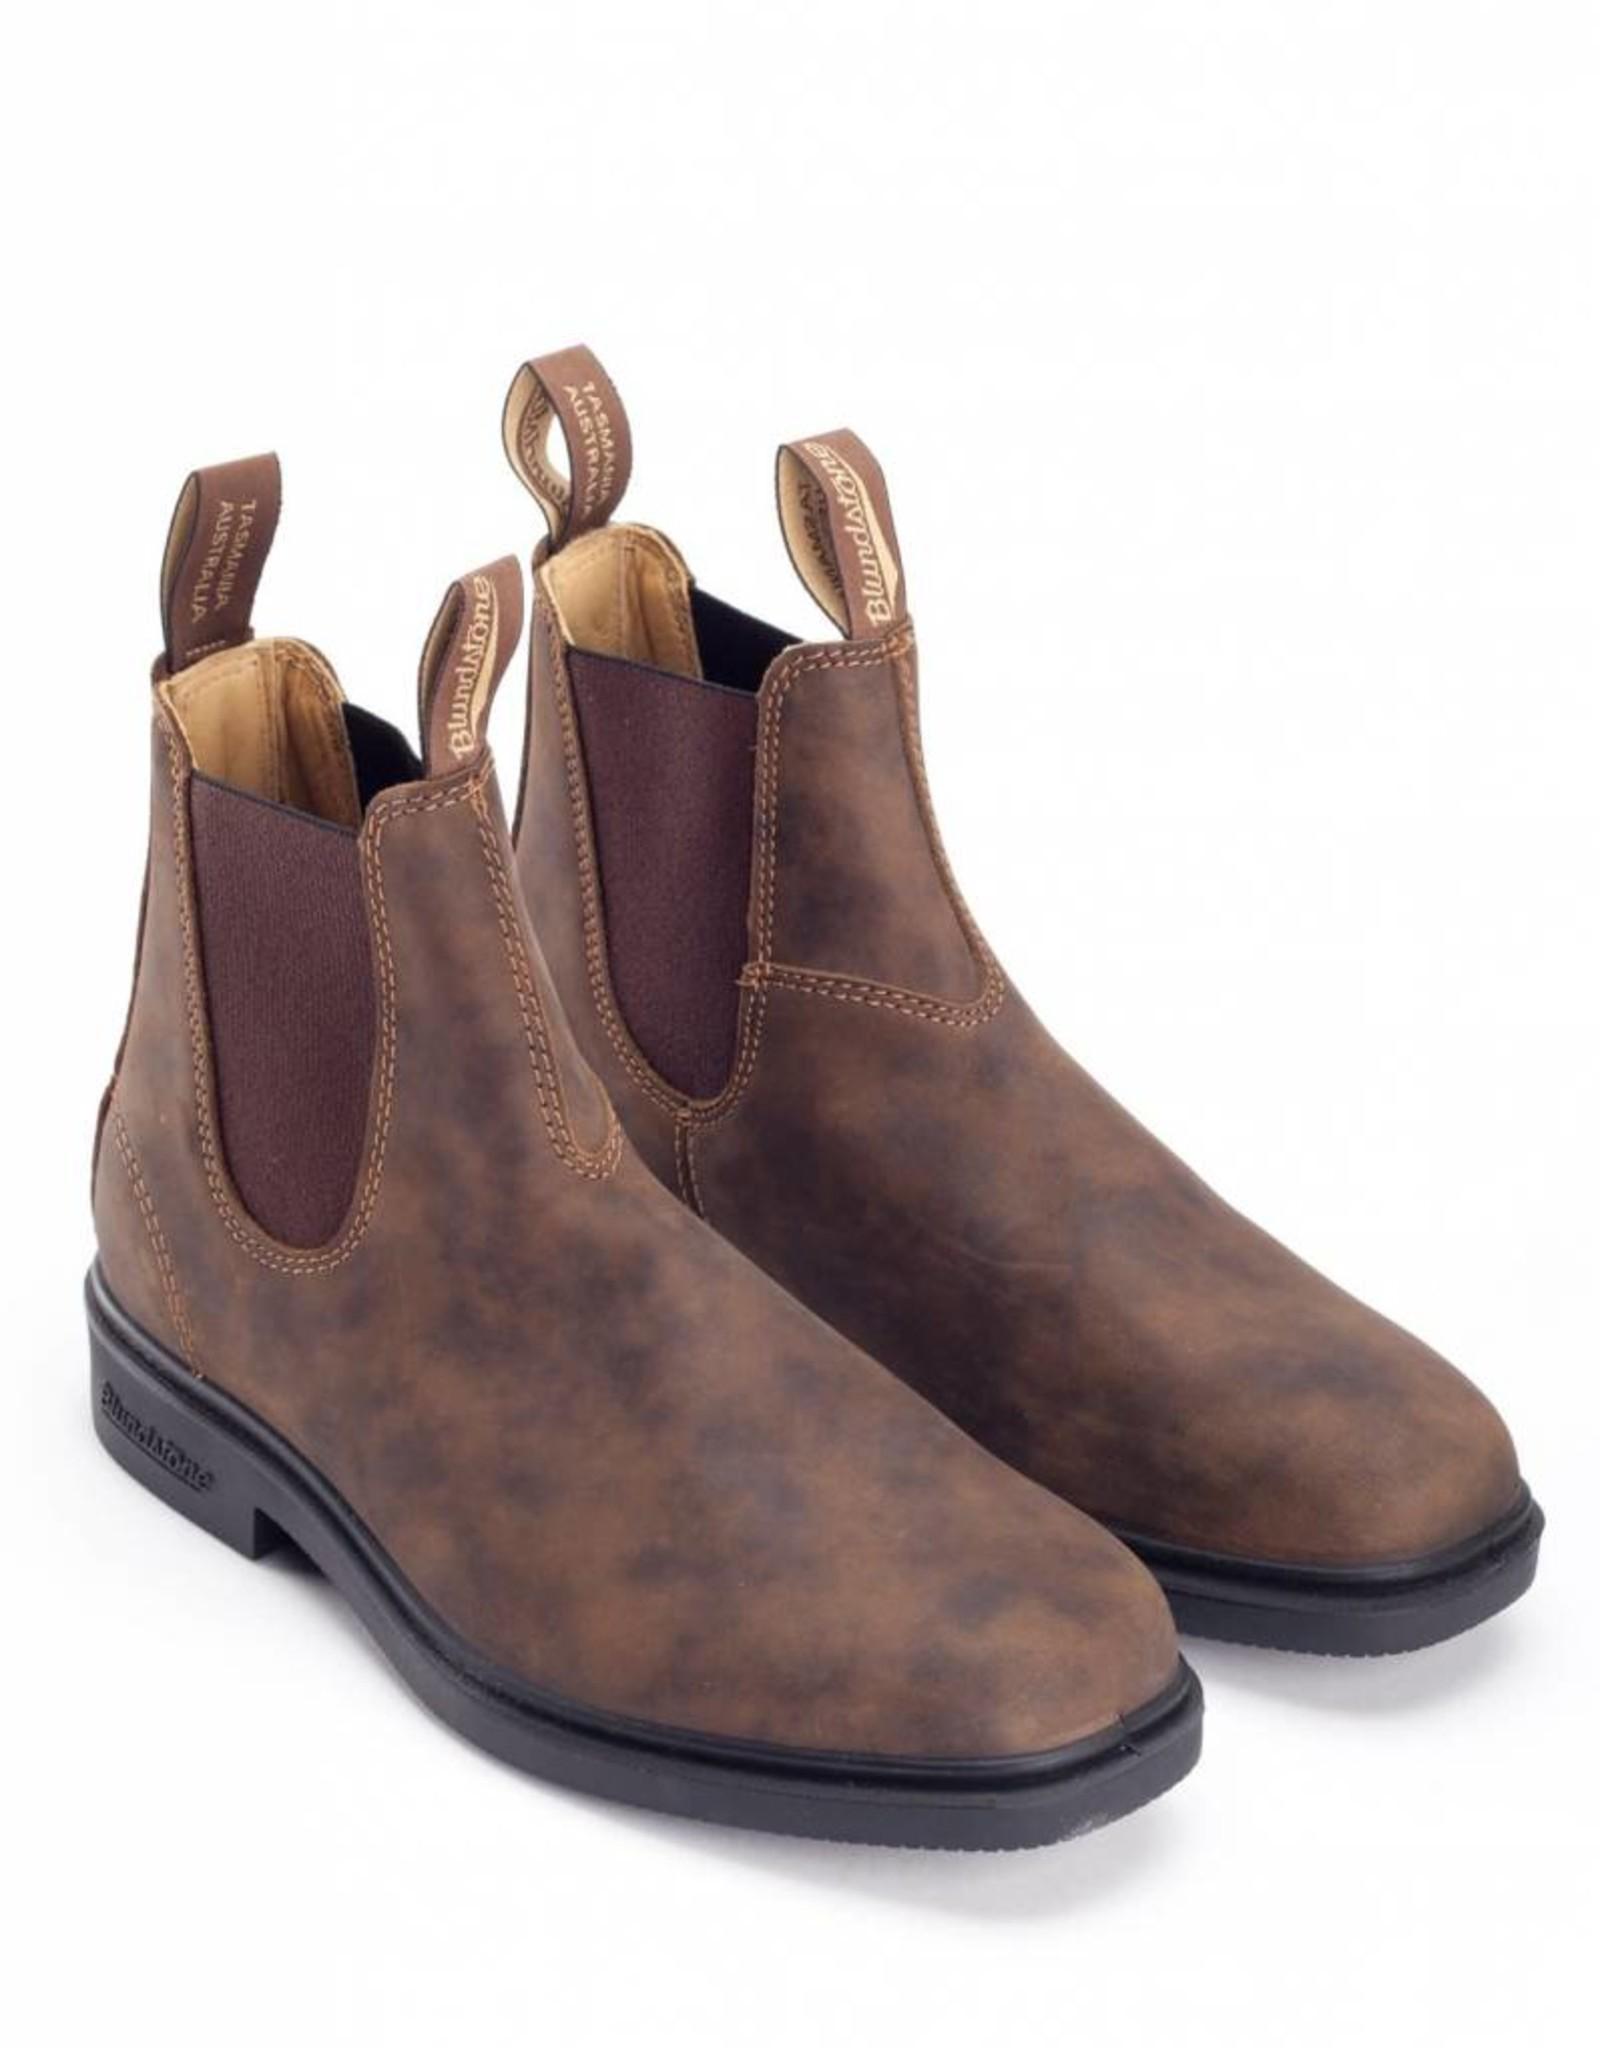 Blundstone Blundstone, Chisel Toe Rustic Brown 1306, , 1WIDTH, 5.5